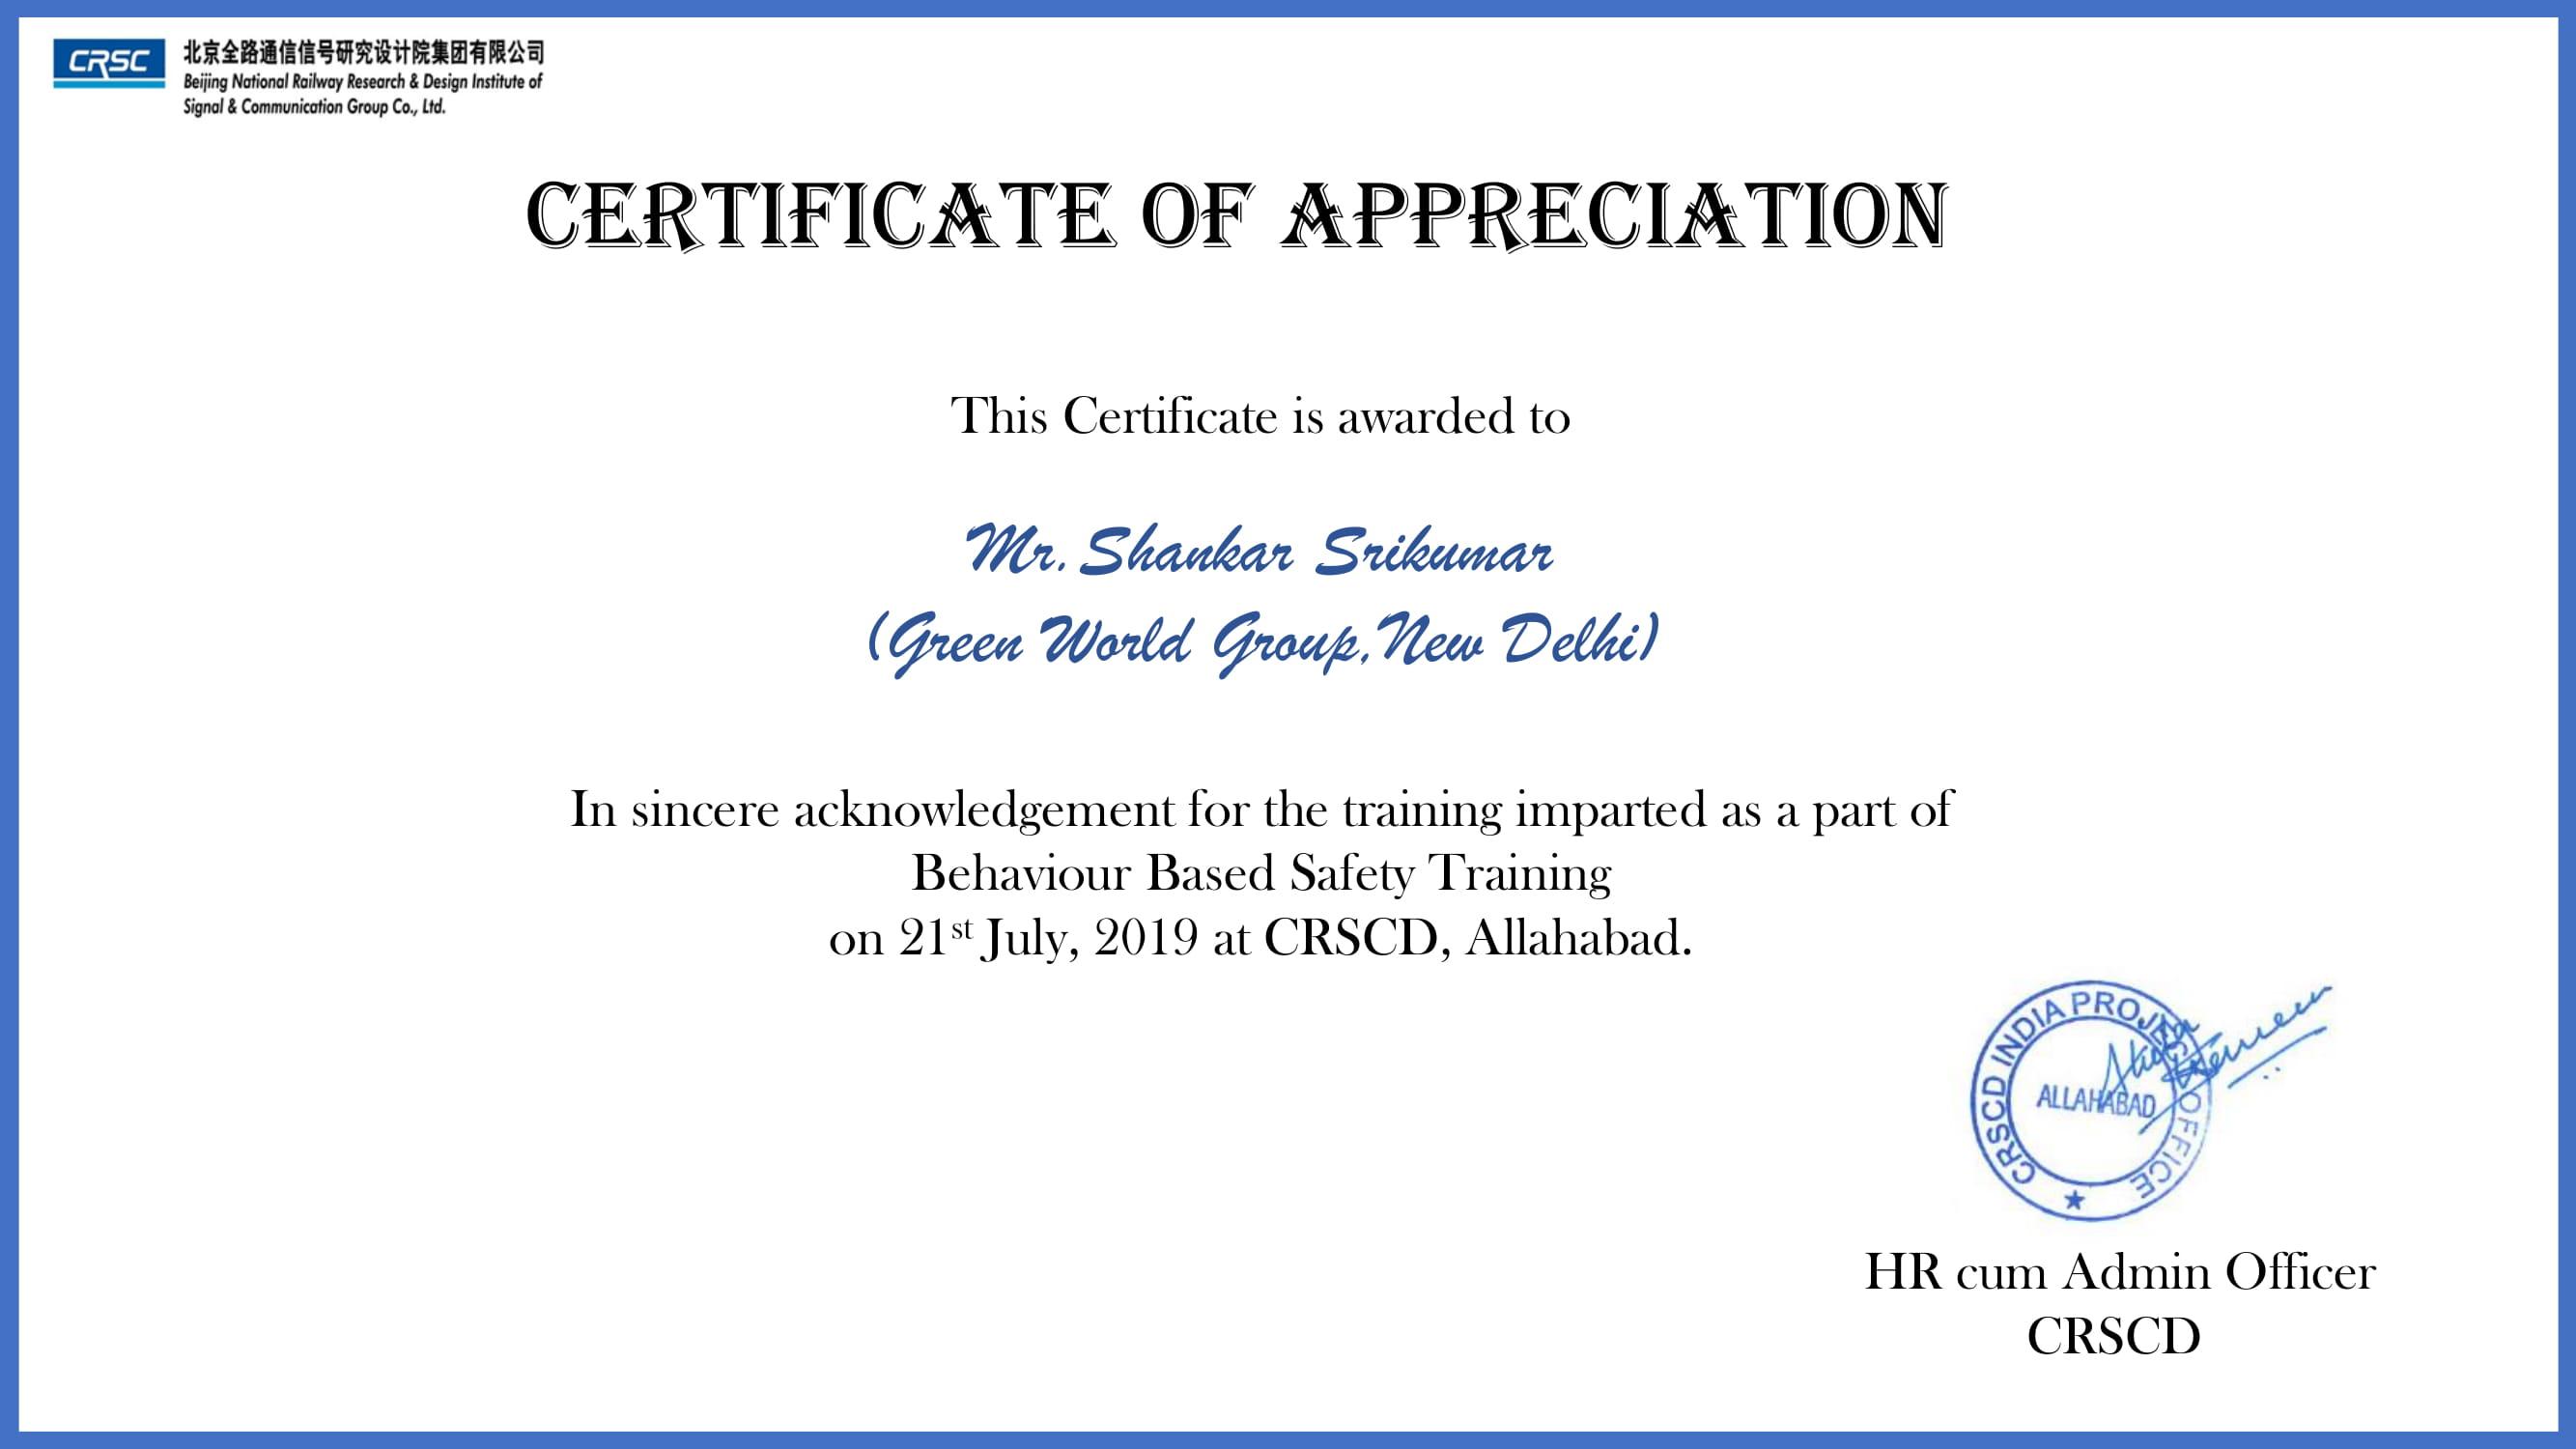 Appreciation certificate - Feedback-1